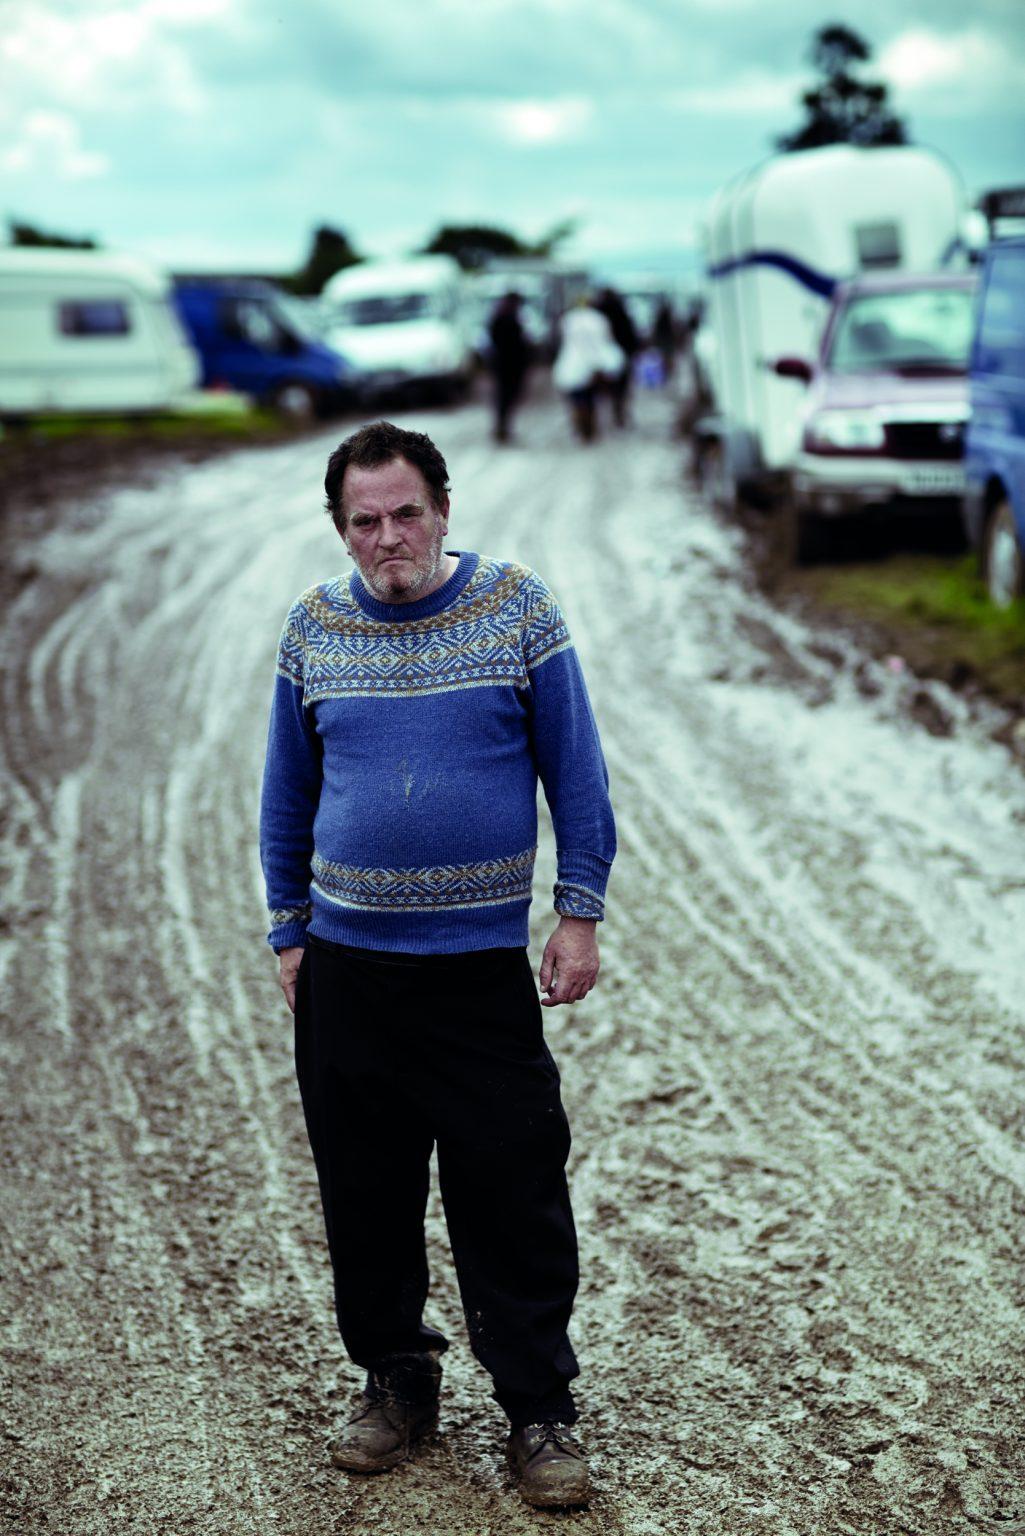 Appleby, United Kingdom, June 2014 - Appleby Horse Fair. Kevin, one of the gypsies gathered for the occasion. ><  Appleby, Regno Unito, giugno 2014 - Appleby Horse Fair. Kevin, uno dei tanti nomadi accorsi per partecipare alla manifestazione. *** Local Caption ***